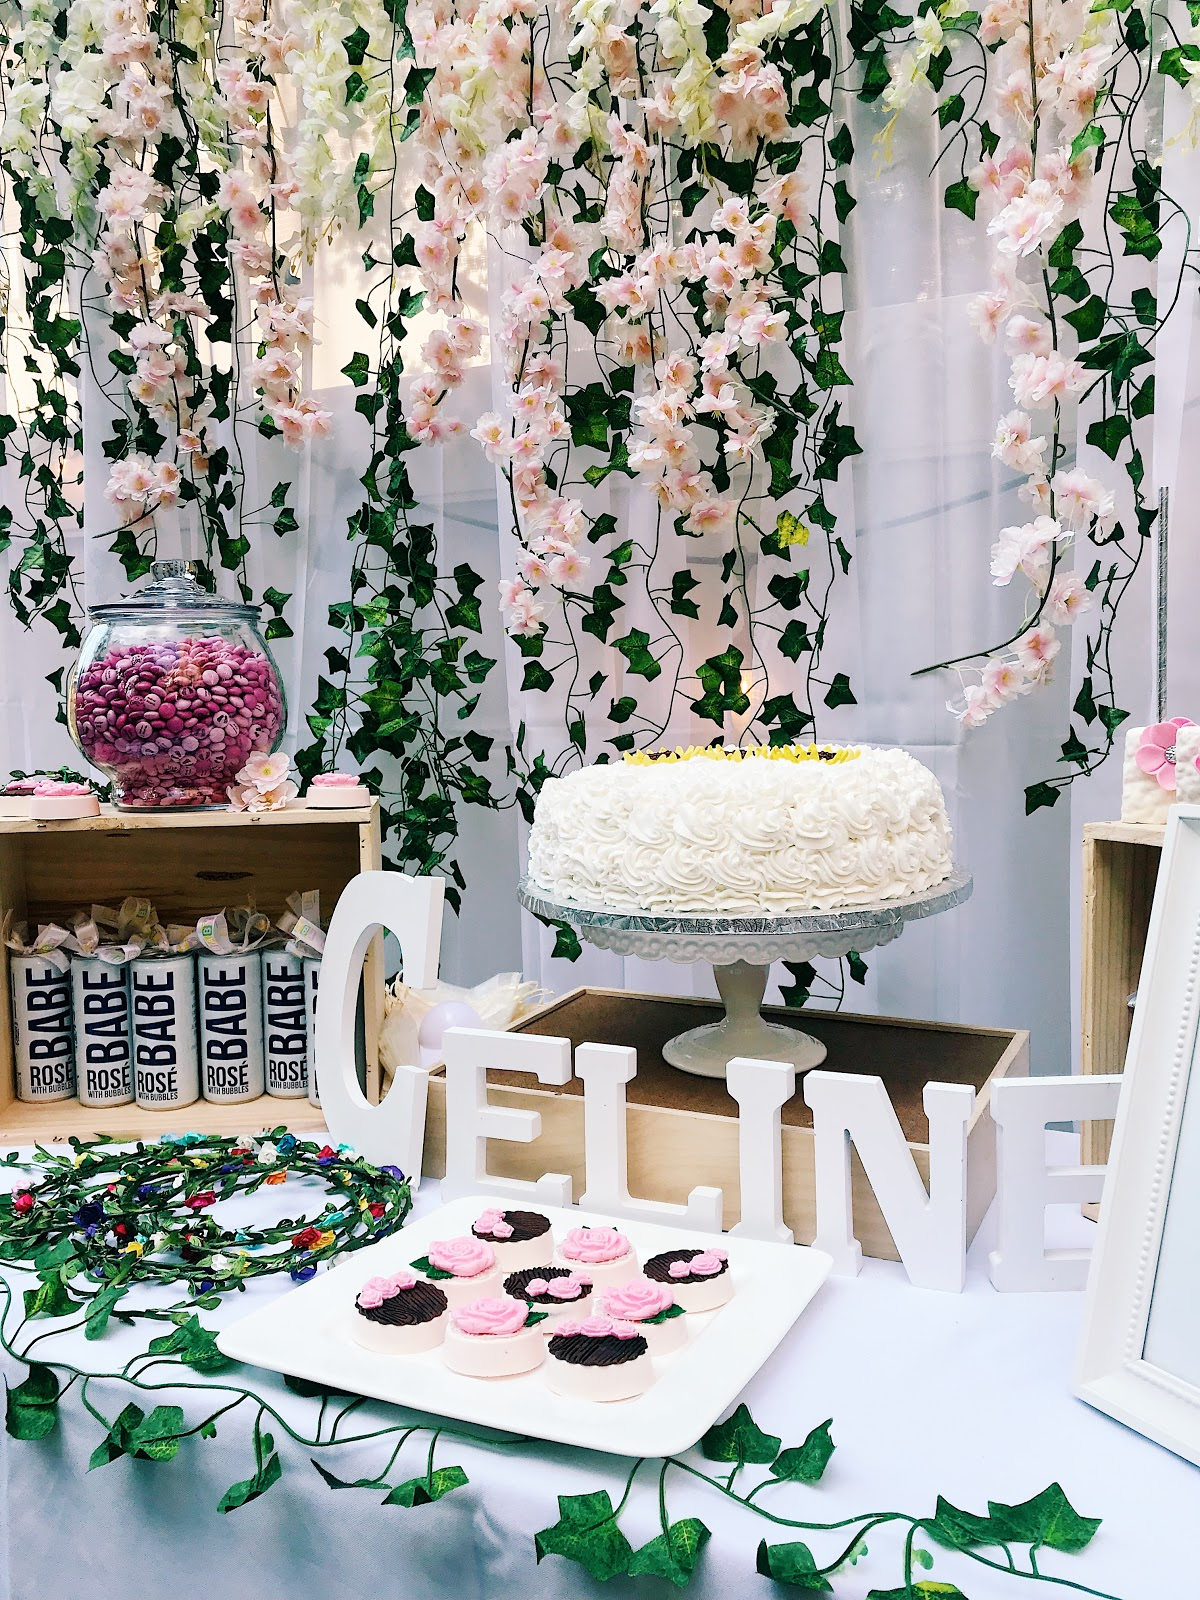 garden theme baby shower, cake table, garden decor, flower crowns